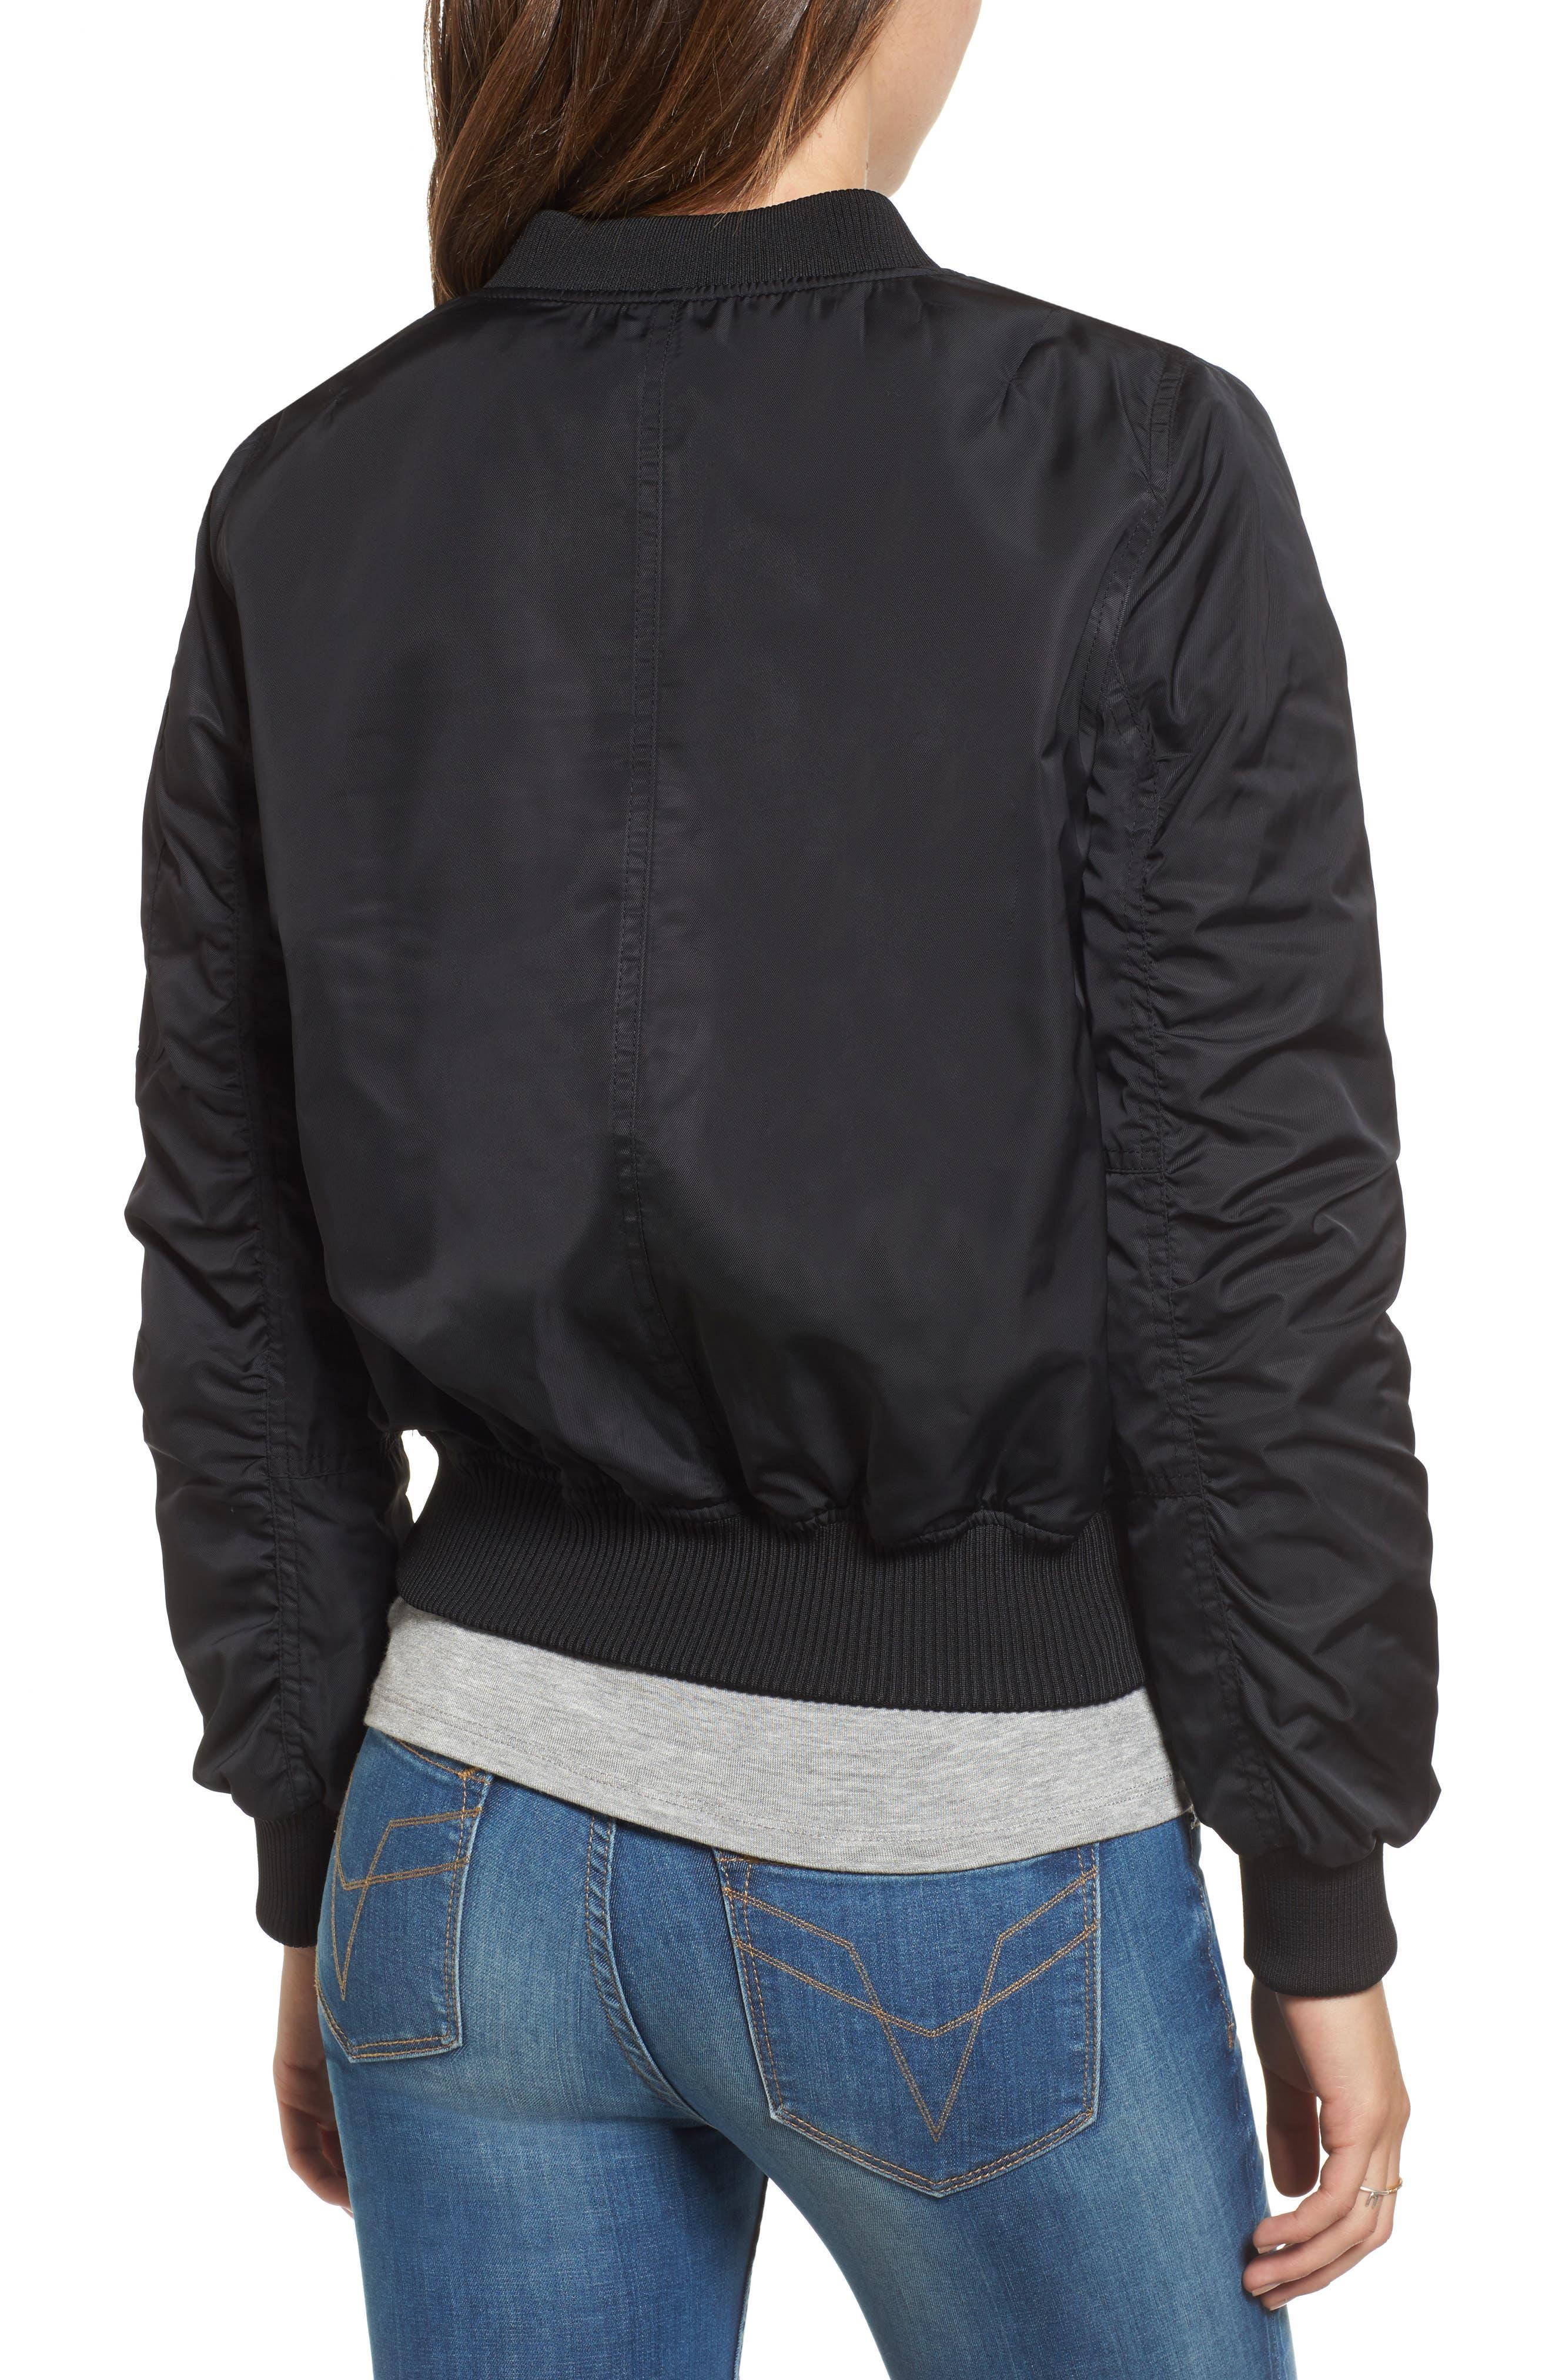 Graham Satin Bomber Jacket,                             Alternate thumbnail 2, color,                             Black